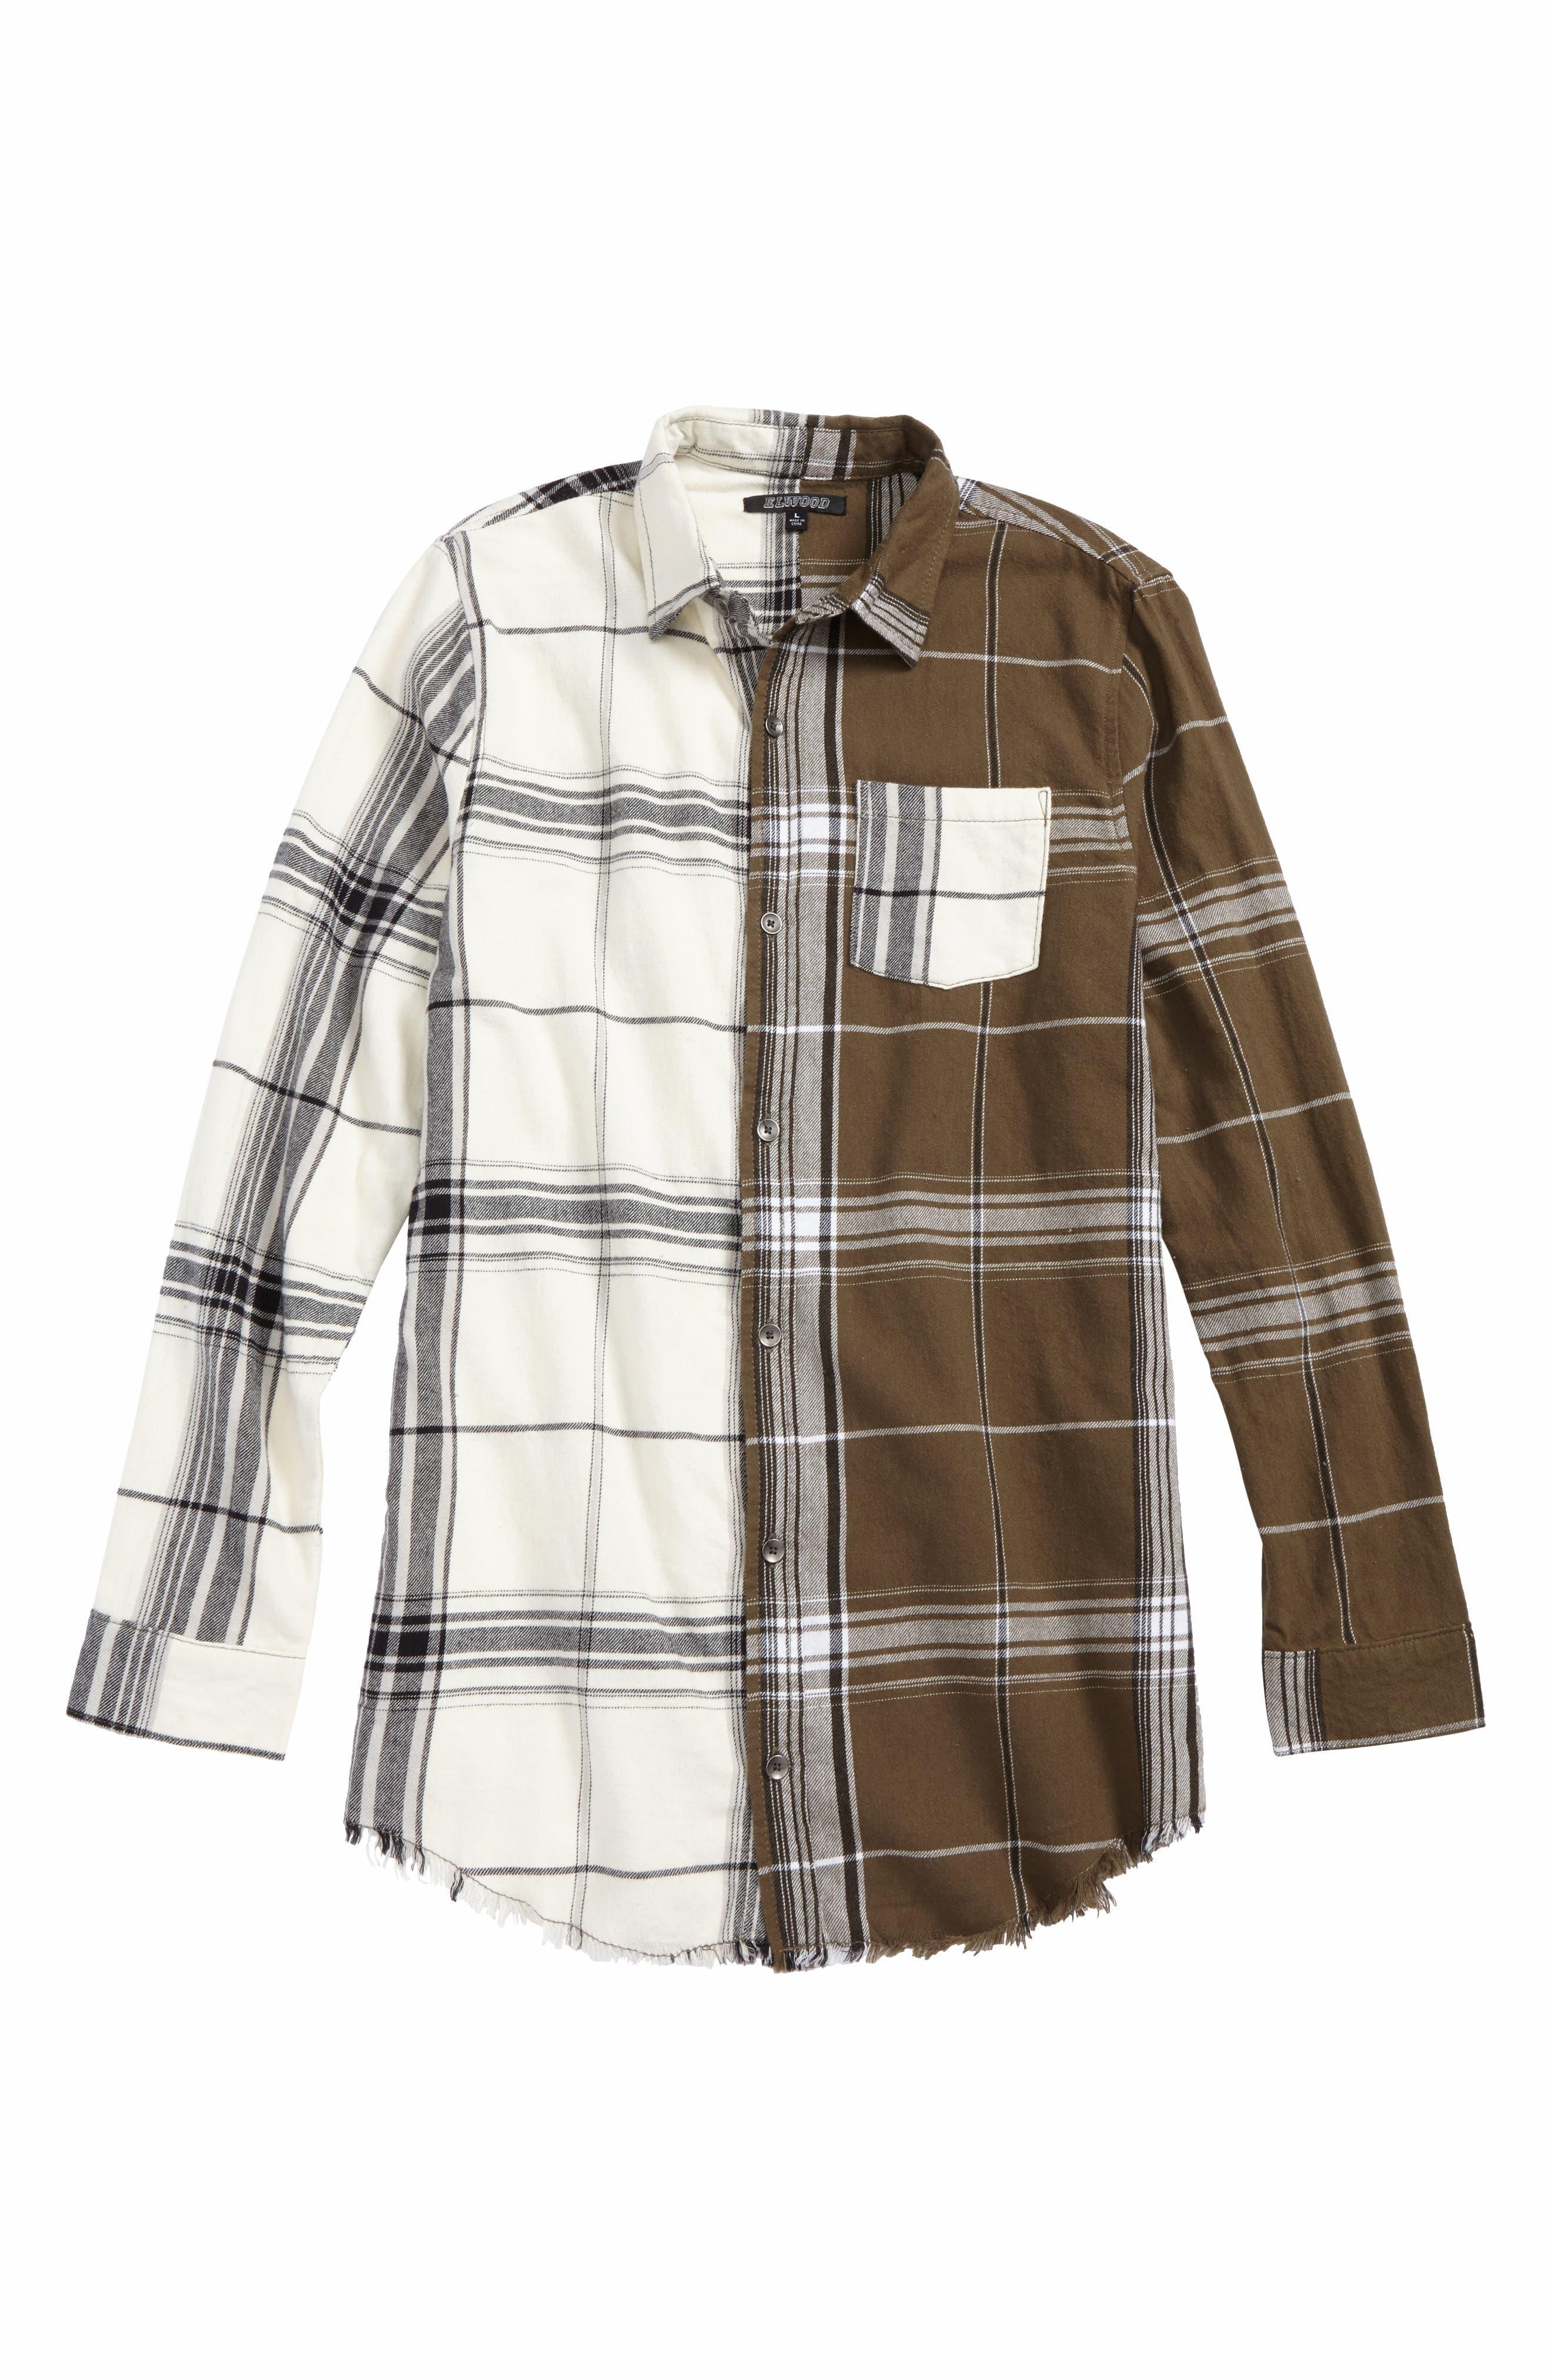 Main Image - Elwood Raw Edge Flannel Shirt (Big Boys)